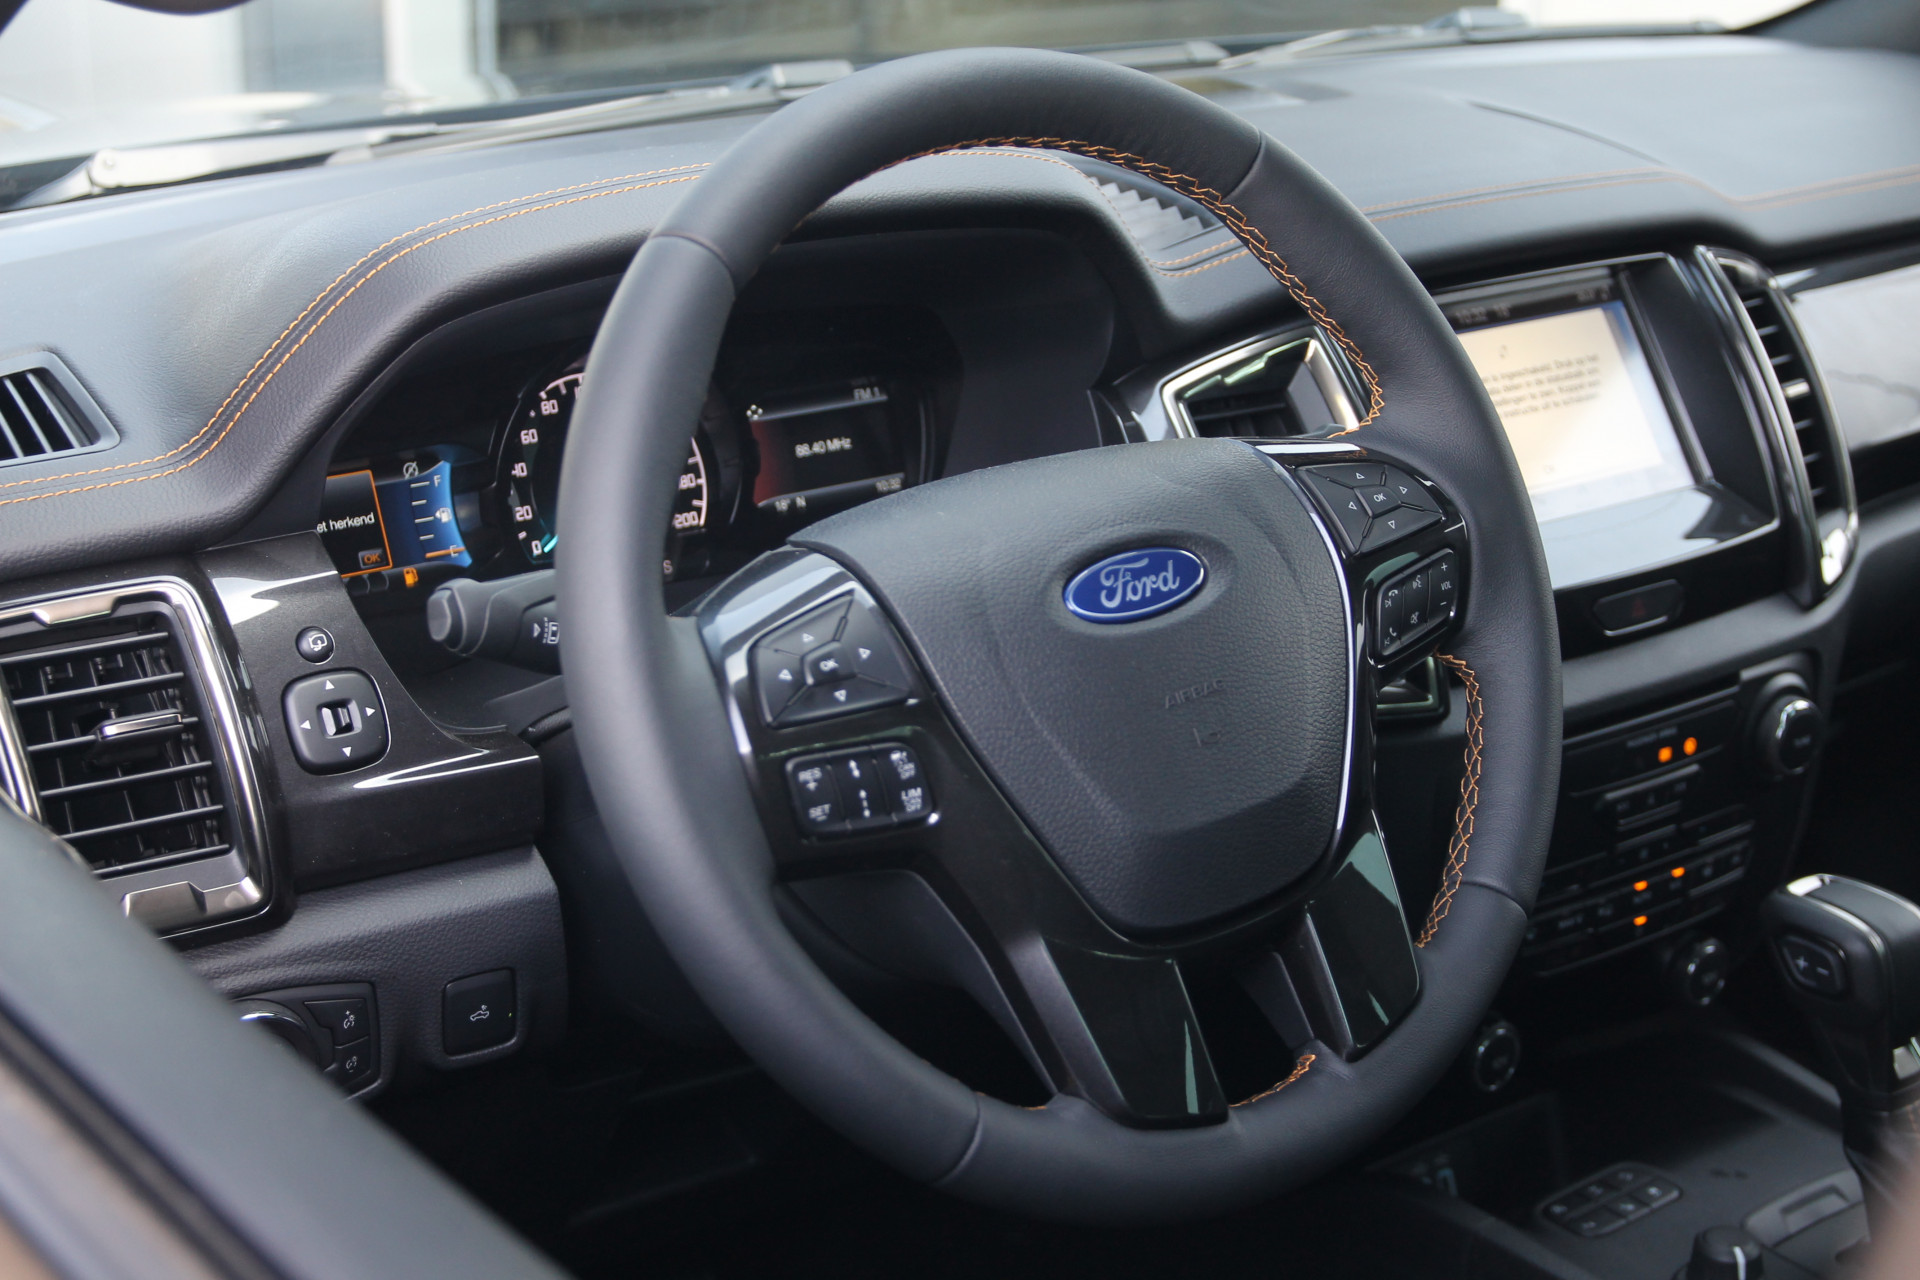 Tweedehands Ford Ranger occasion